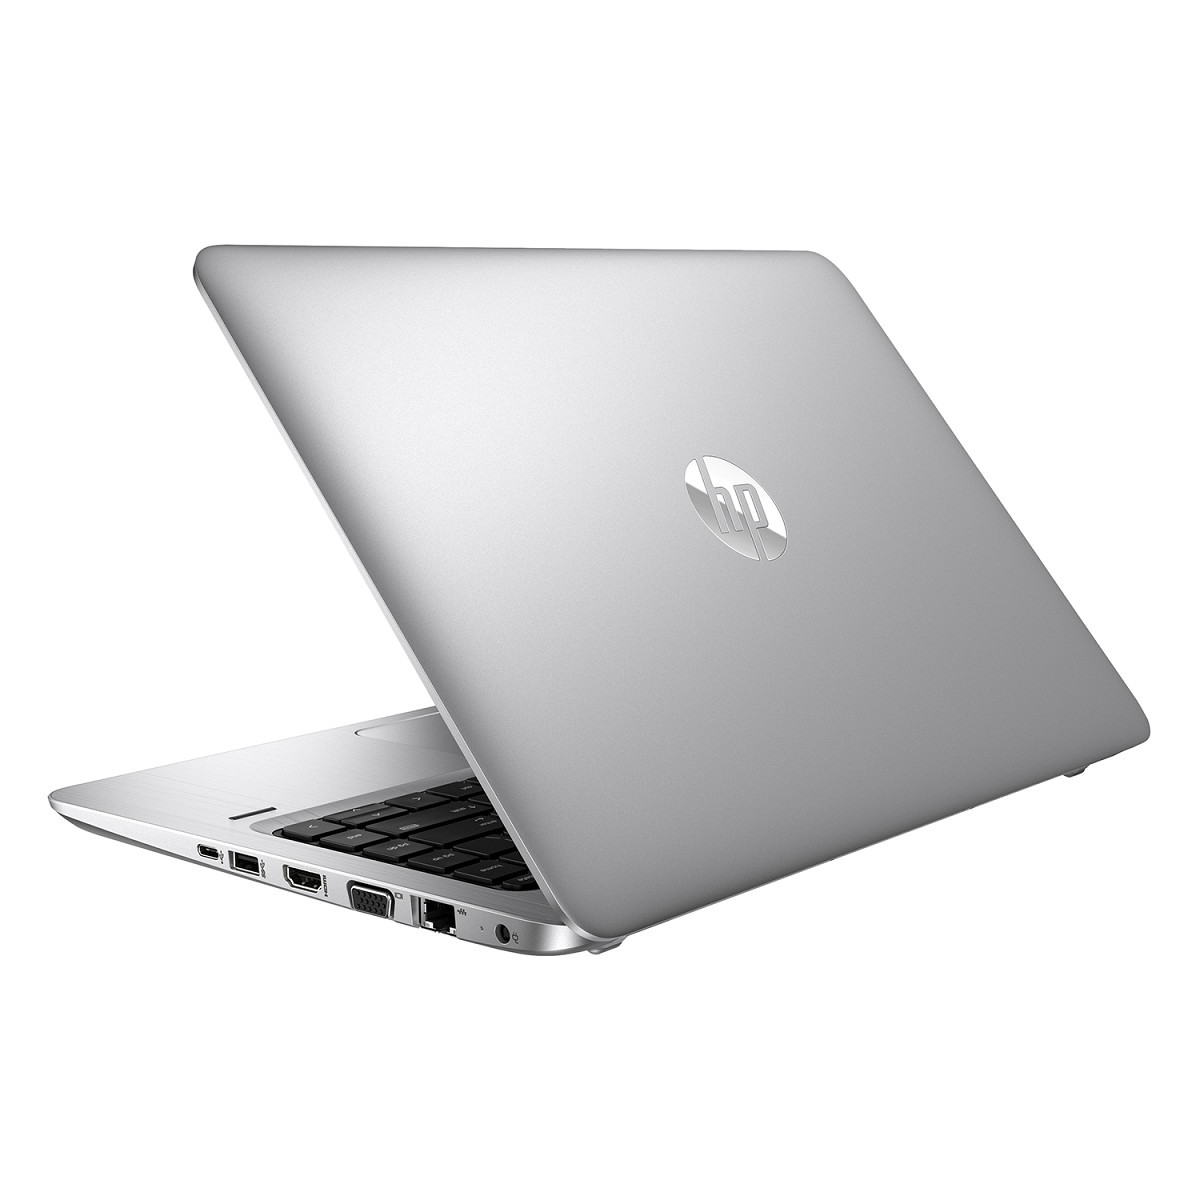 HP Probook 430G5 2XR79PA (Bạc)